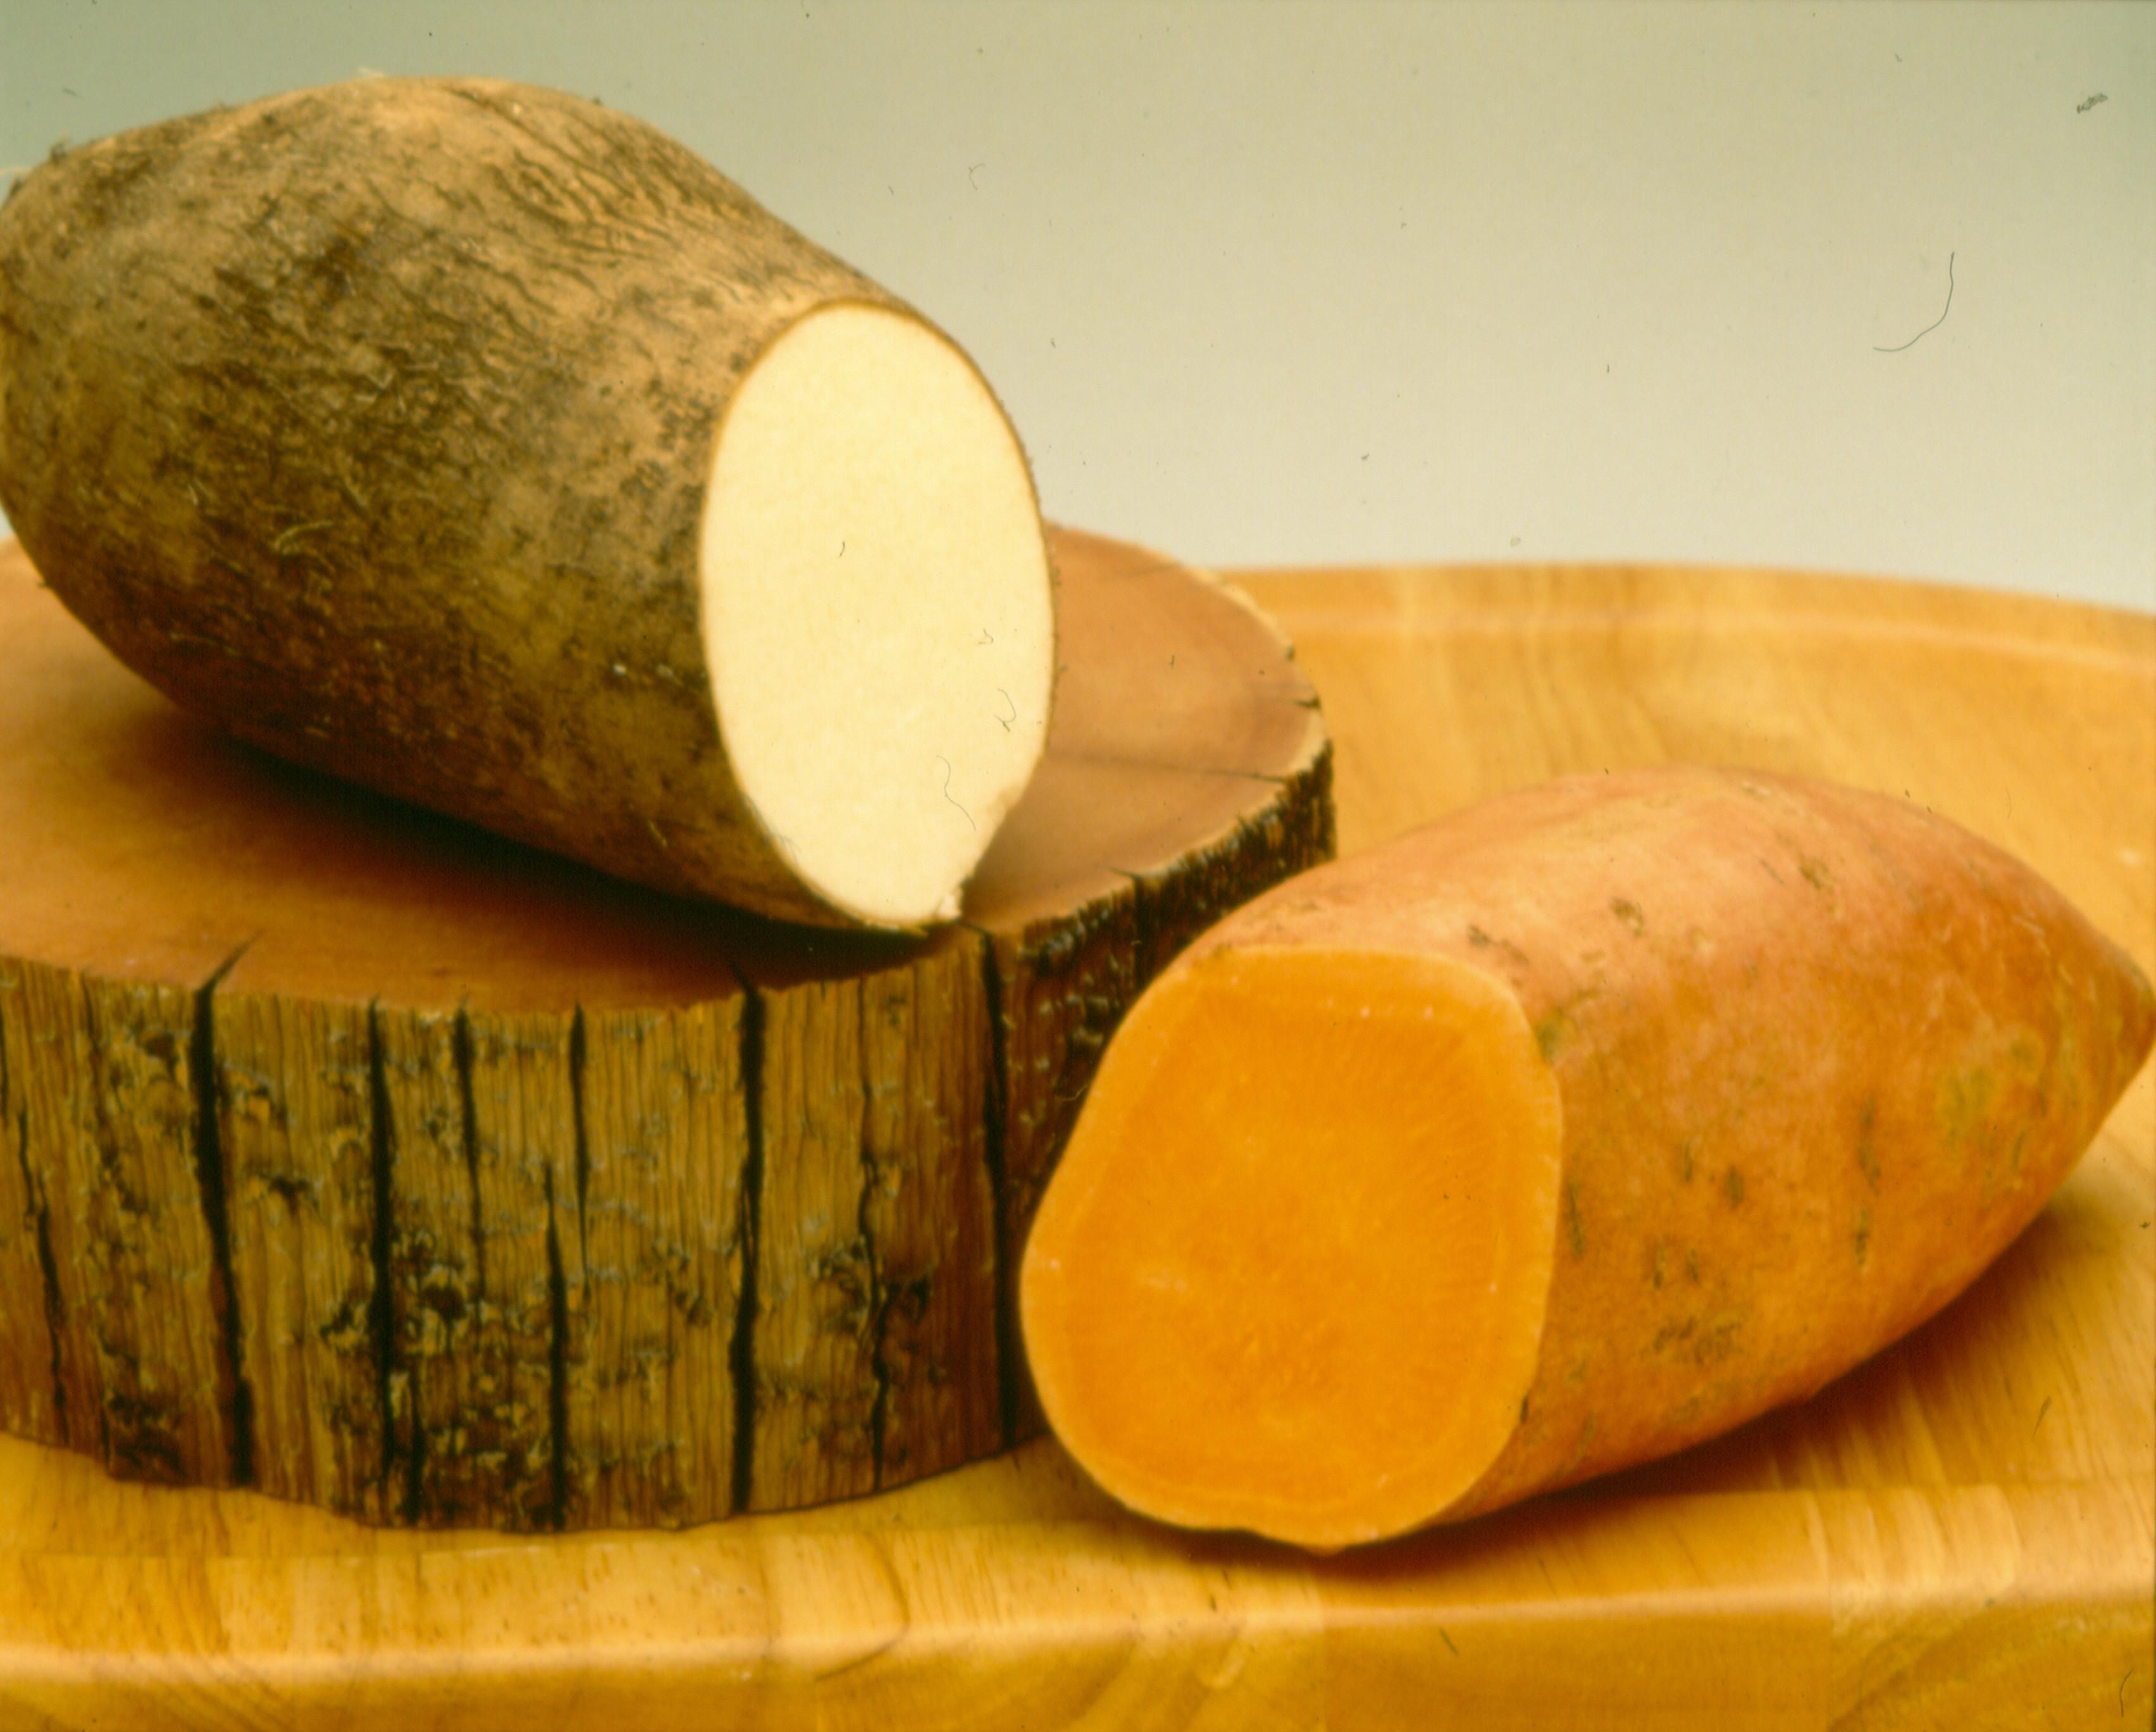 Sweet Potato Vs Yam  Produce Confusion Yam or Sweet Potato Rutabaga or Turnip